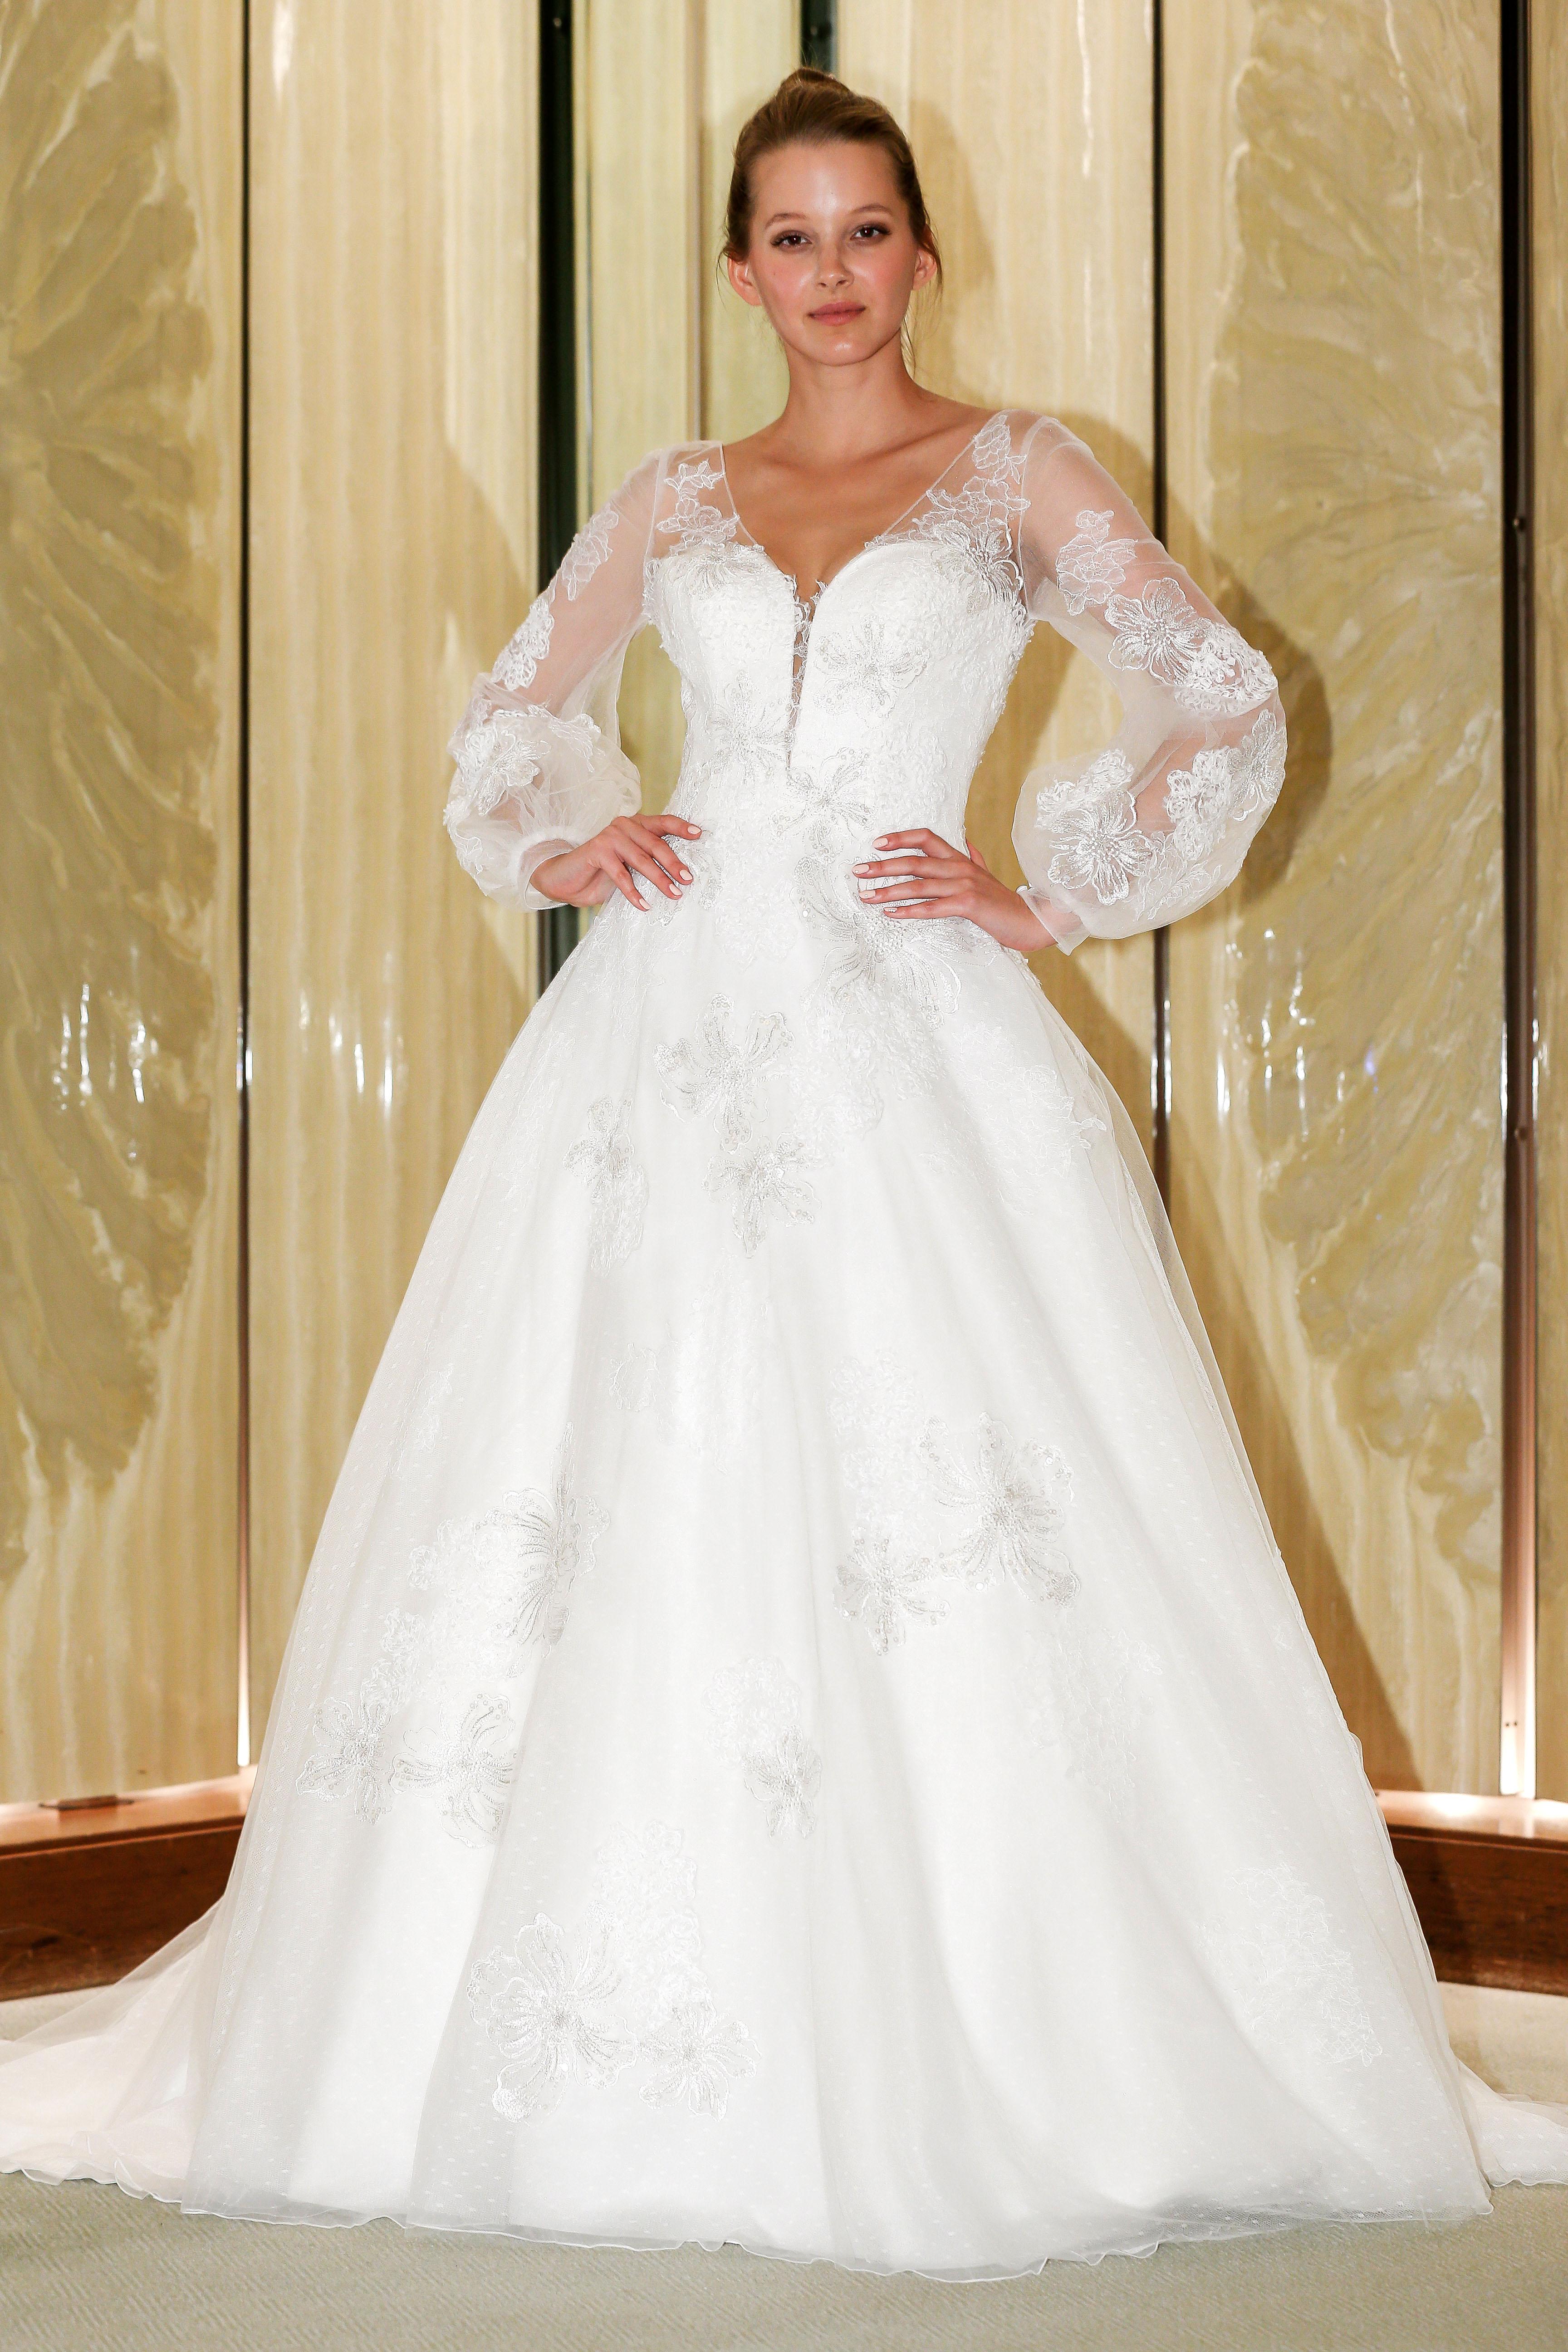 randy fenoli wedding dress long sleeves ball gown floral applique